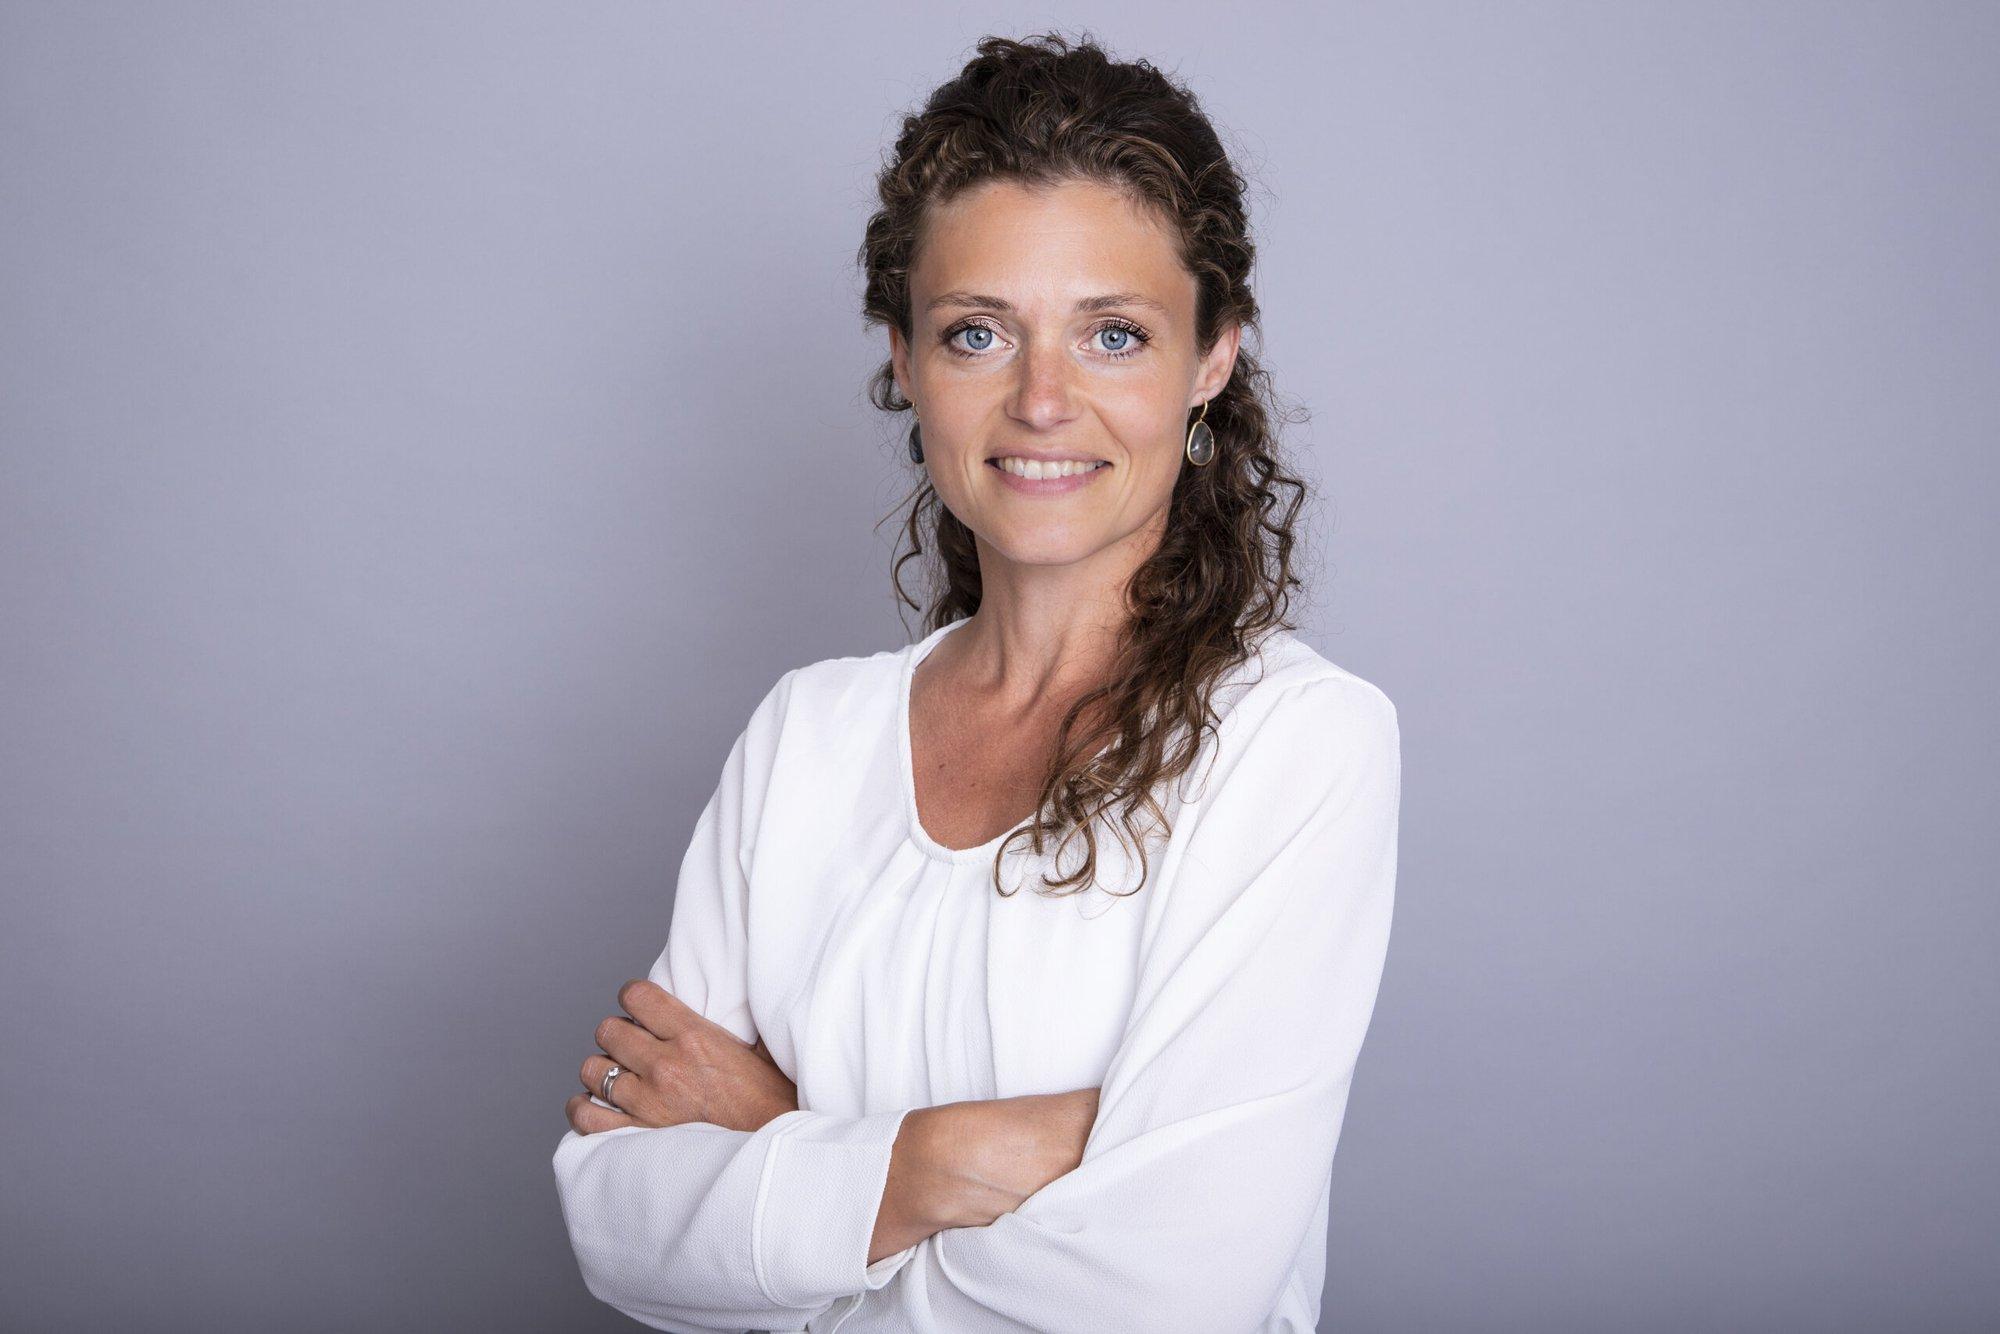 The Big Exit Show: Eline van Beest on exiting her startup to Philips